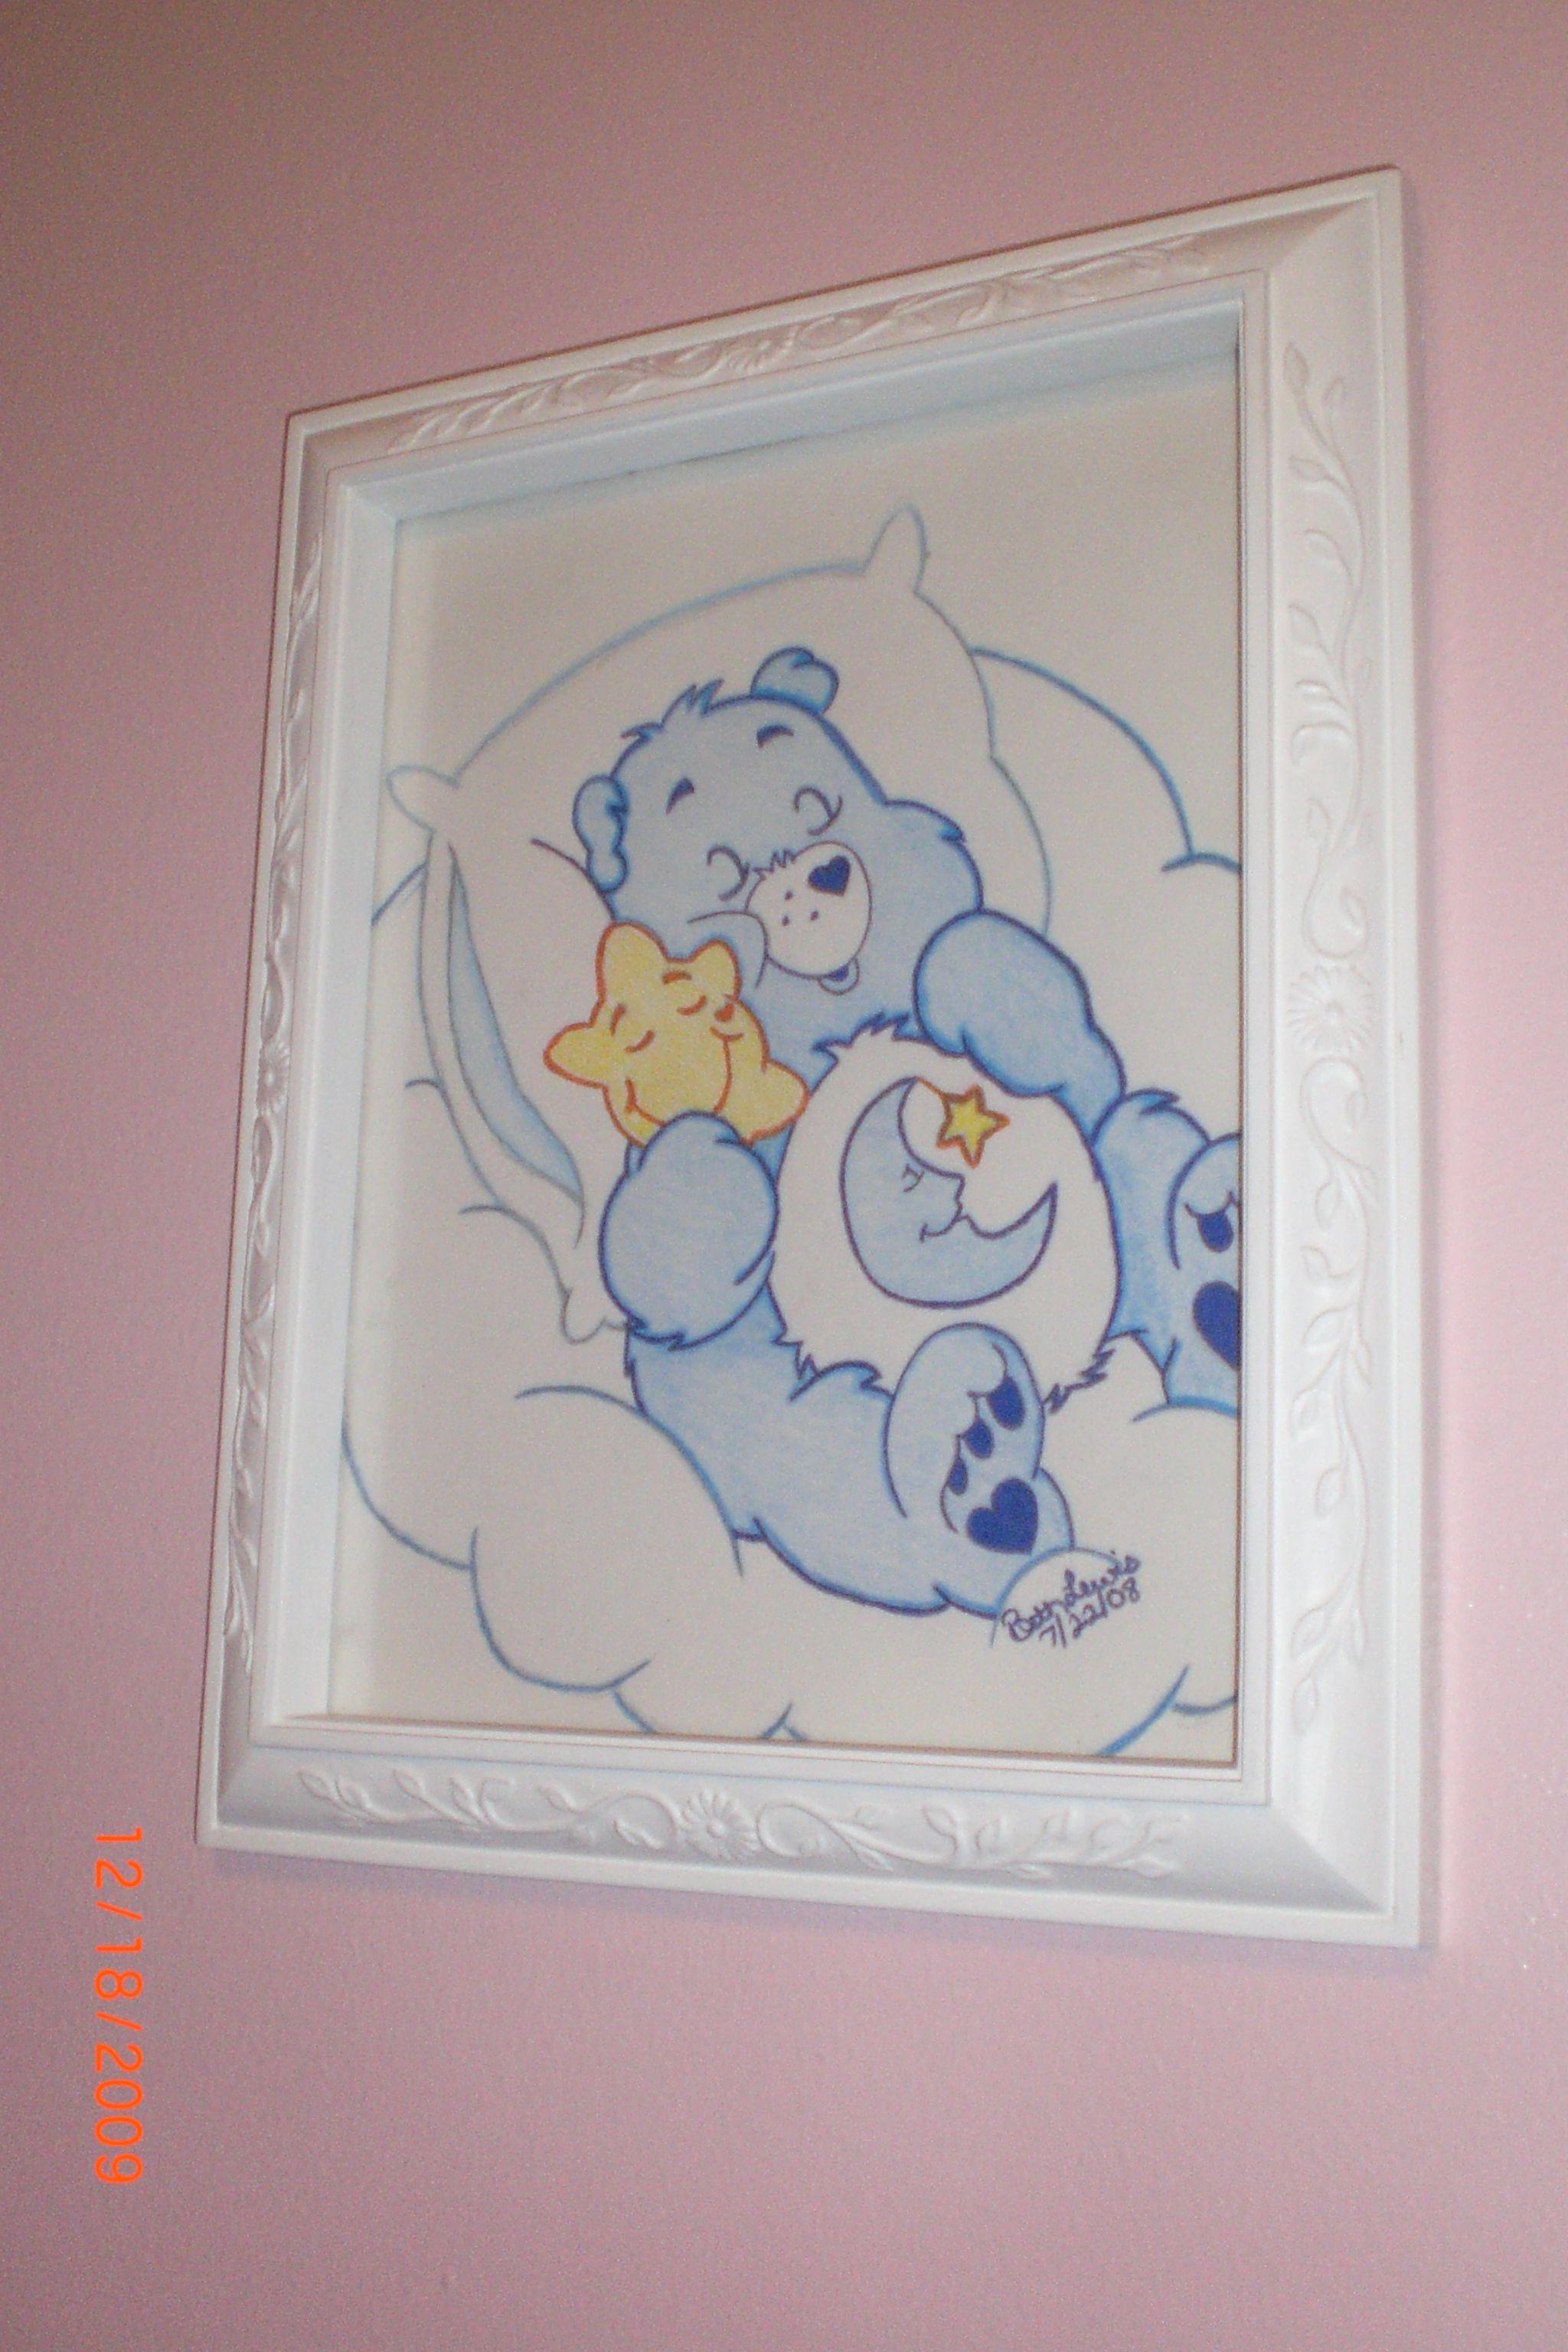 Care Bears I Drew For Daughter's Bedroom.